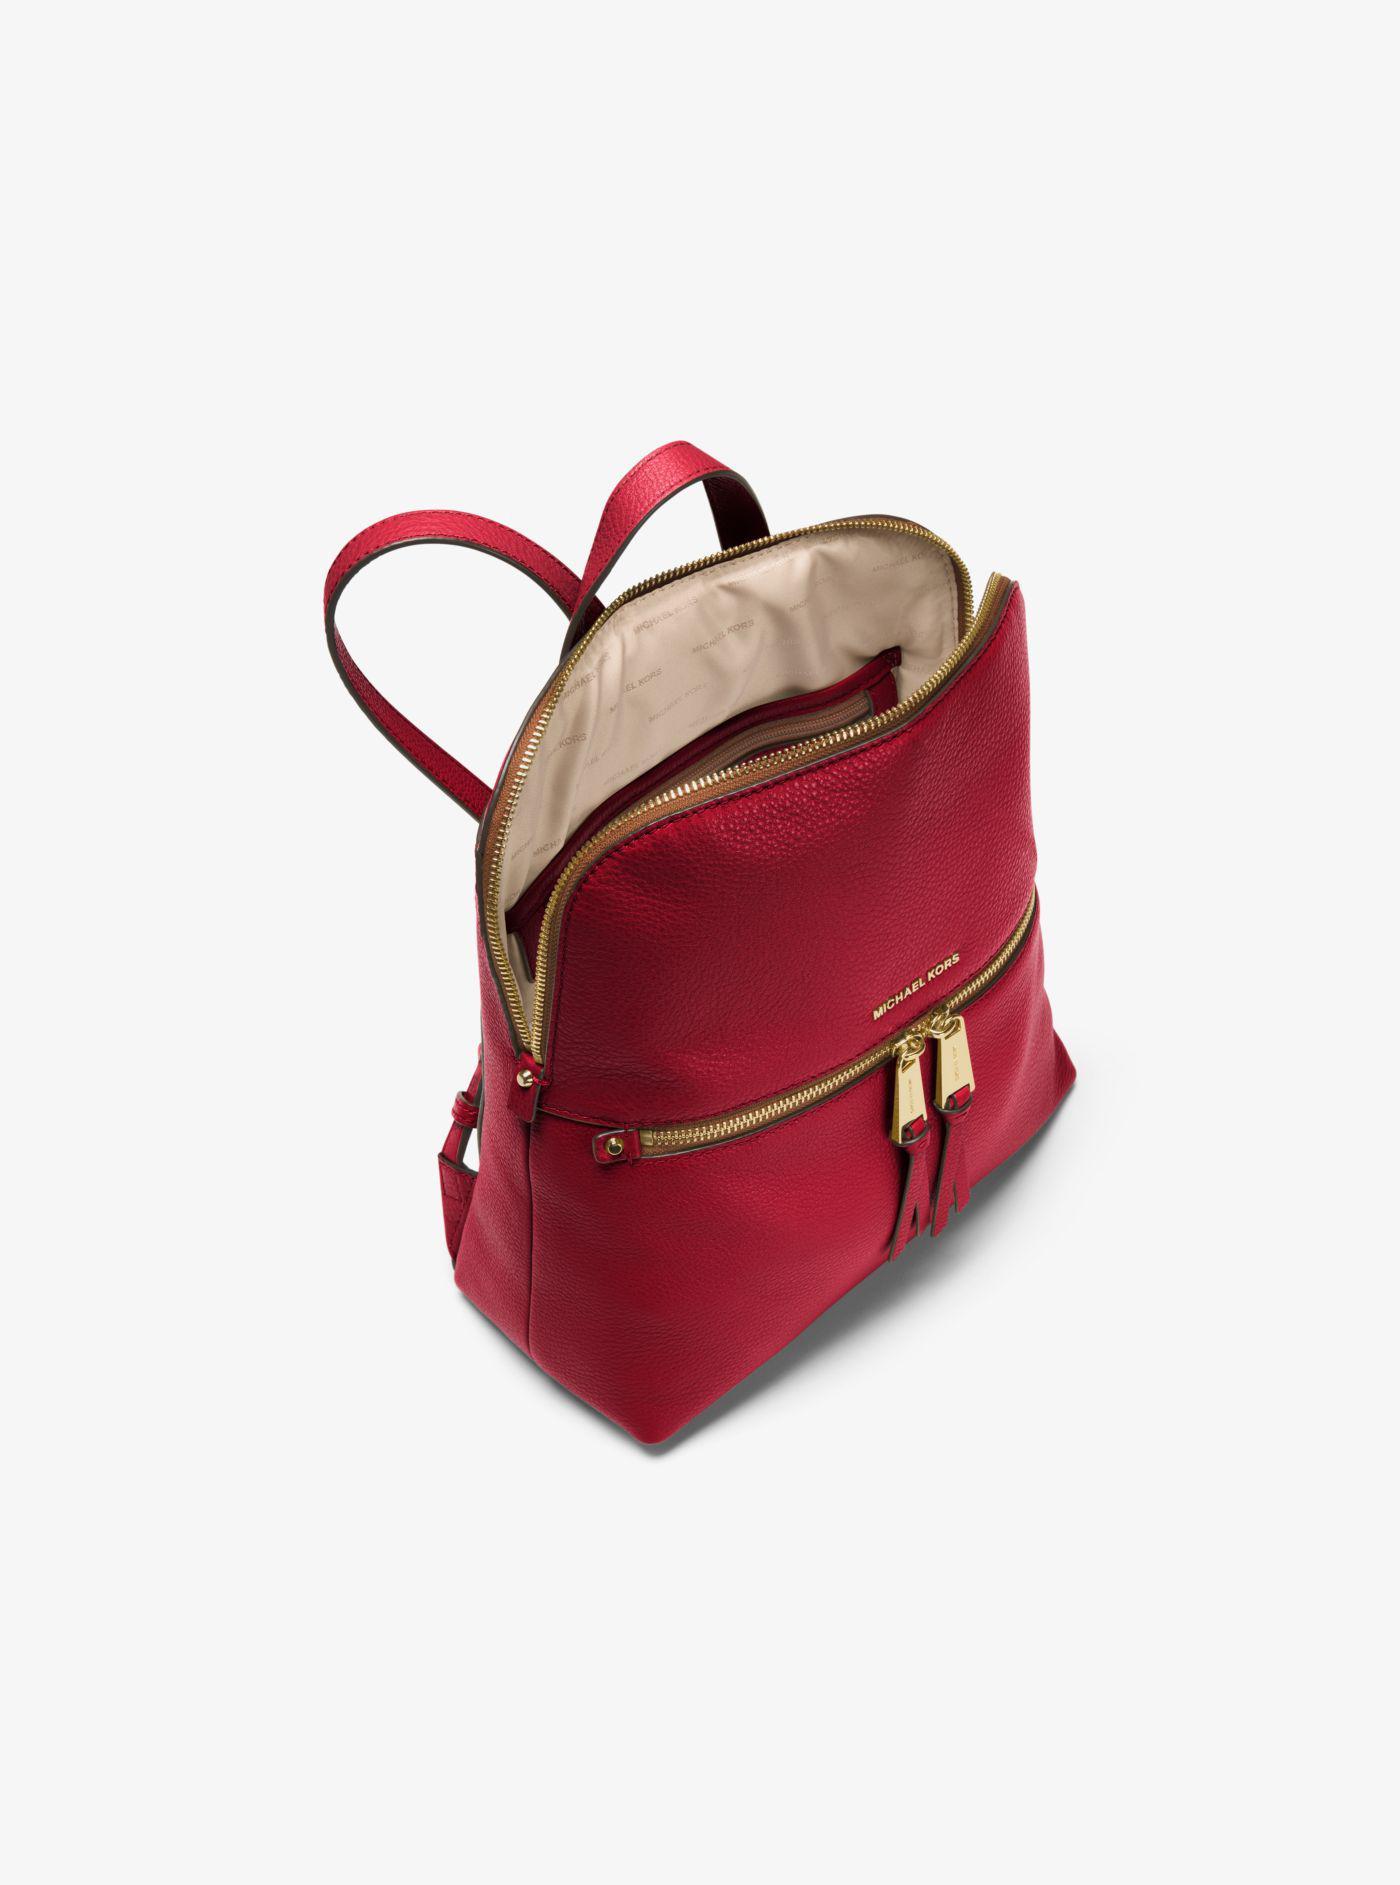 f55c4a6b7ae0 ... sale lyst michael kors rhea medium slim leather backpack in red 604a2  d10b6